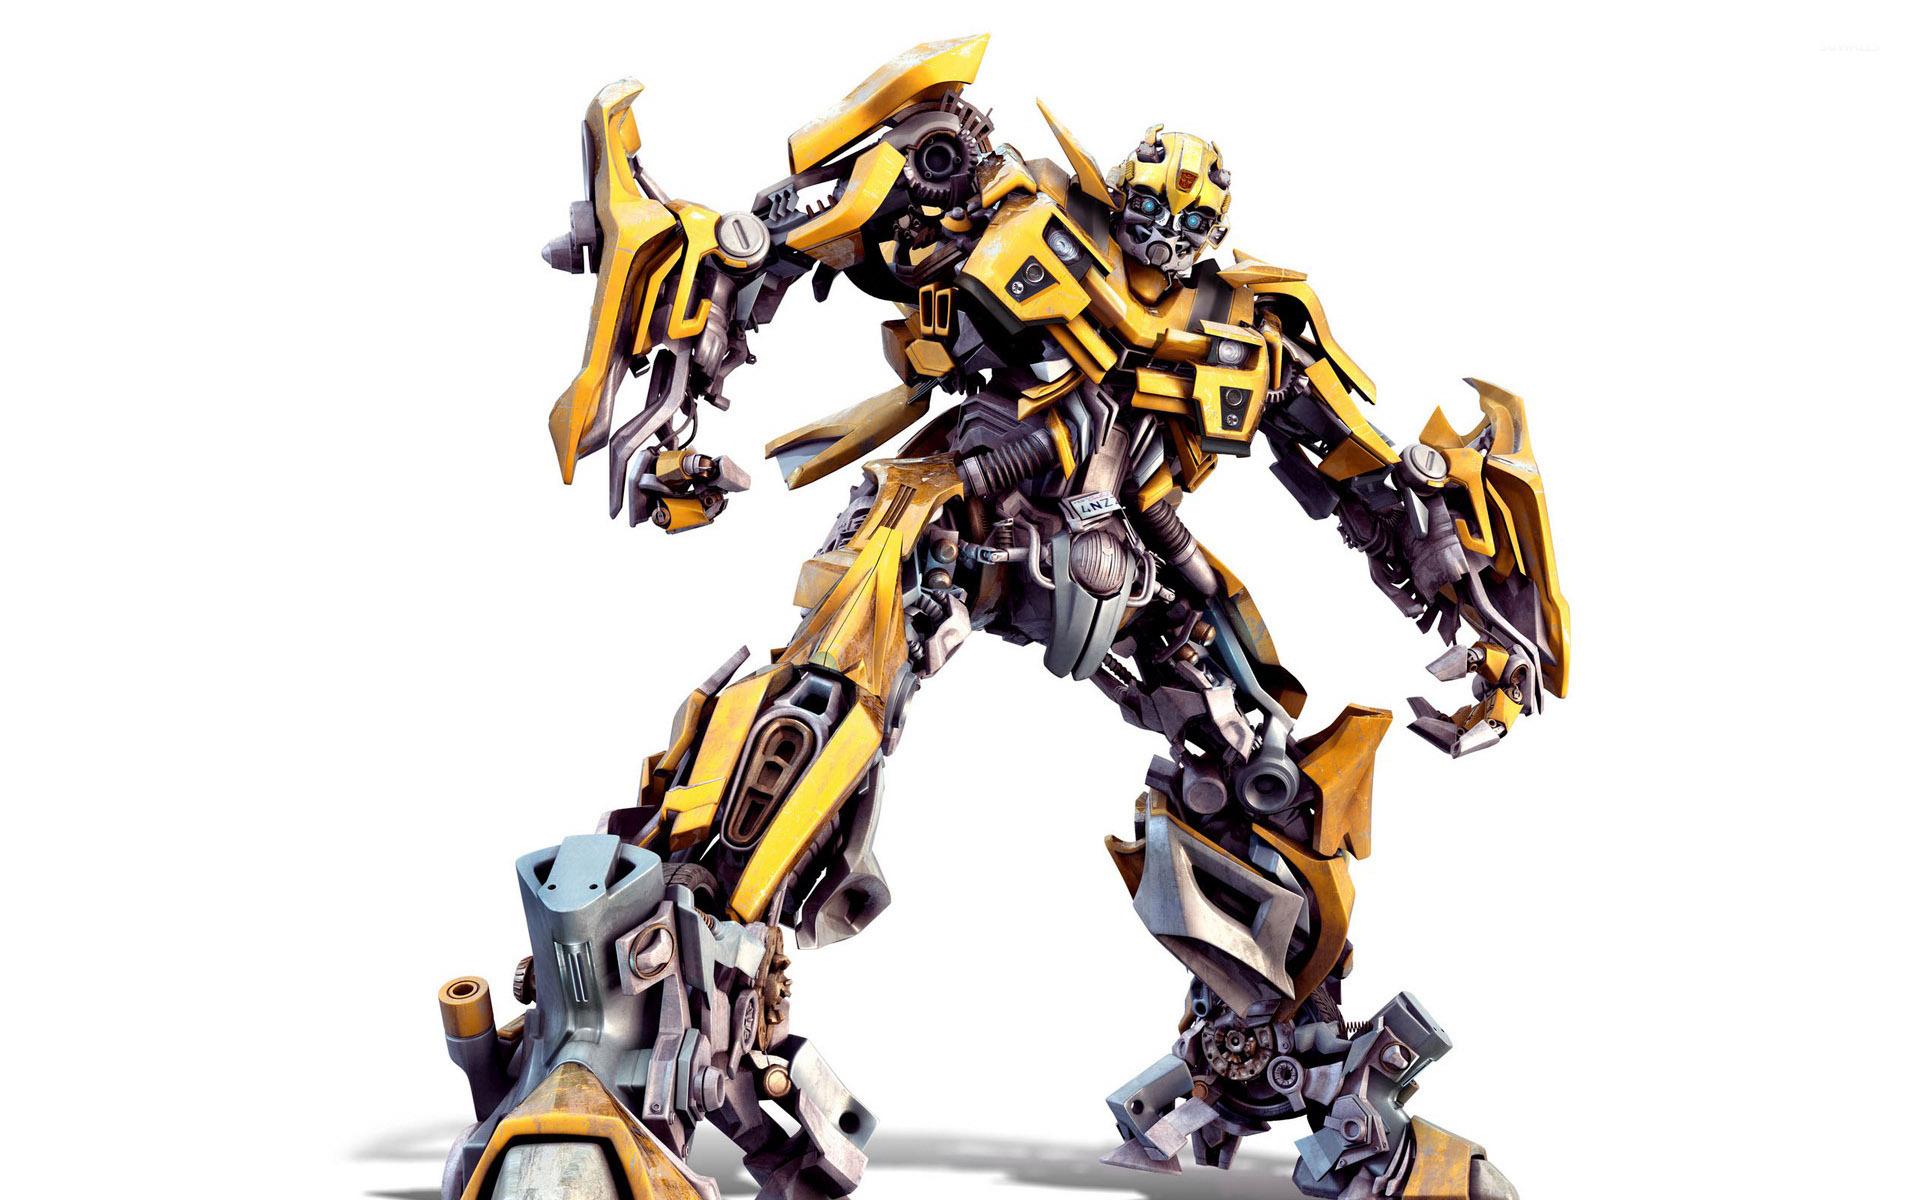 bumblebee transformers 10 wallpaper movie wallpapers 34370. Black Bedroom Furniture Sets. Home Design Ideas